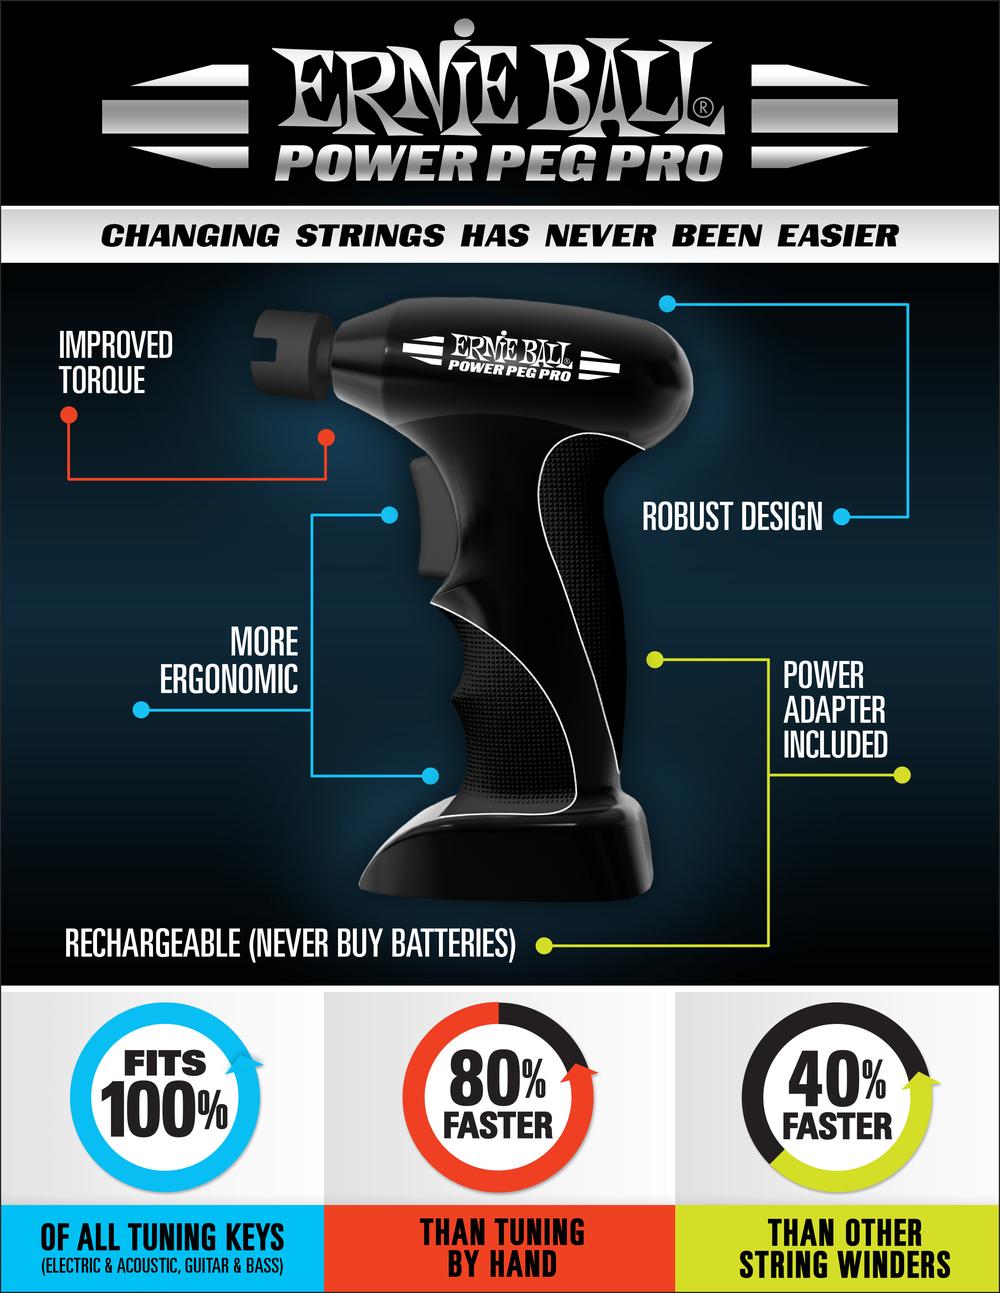 EB Power Peg Pro Ad